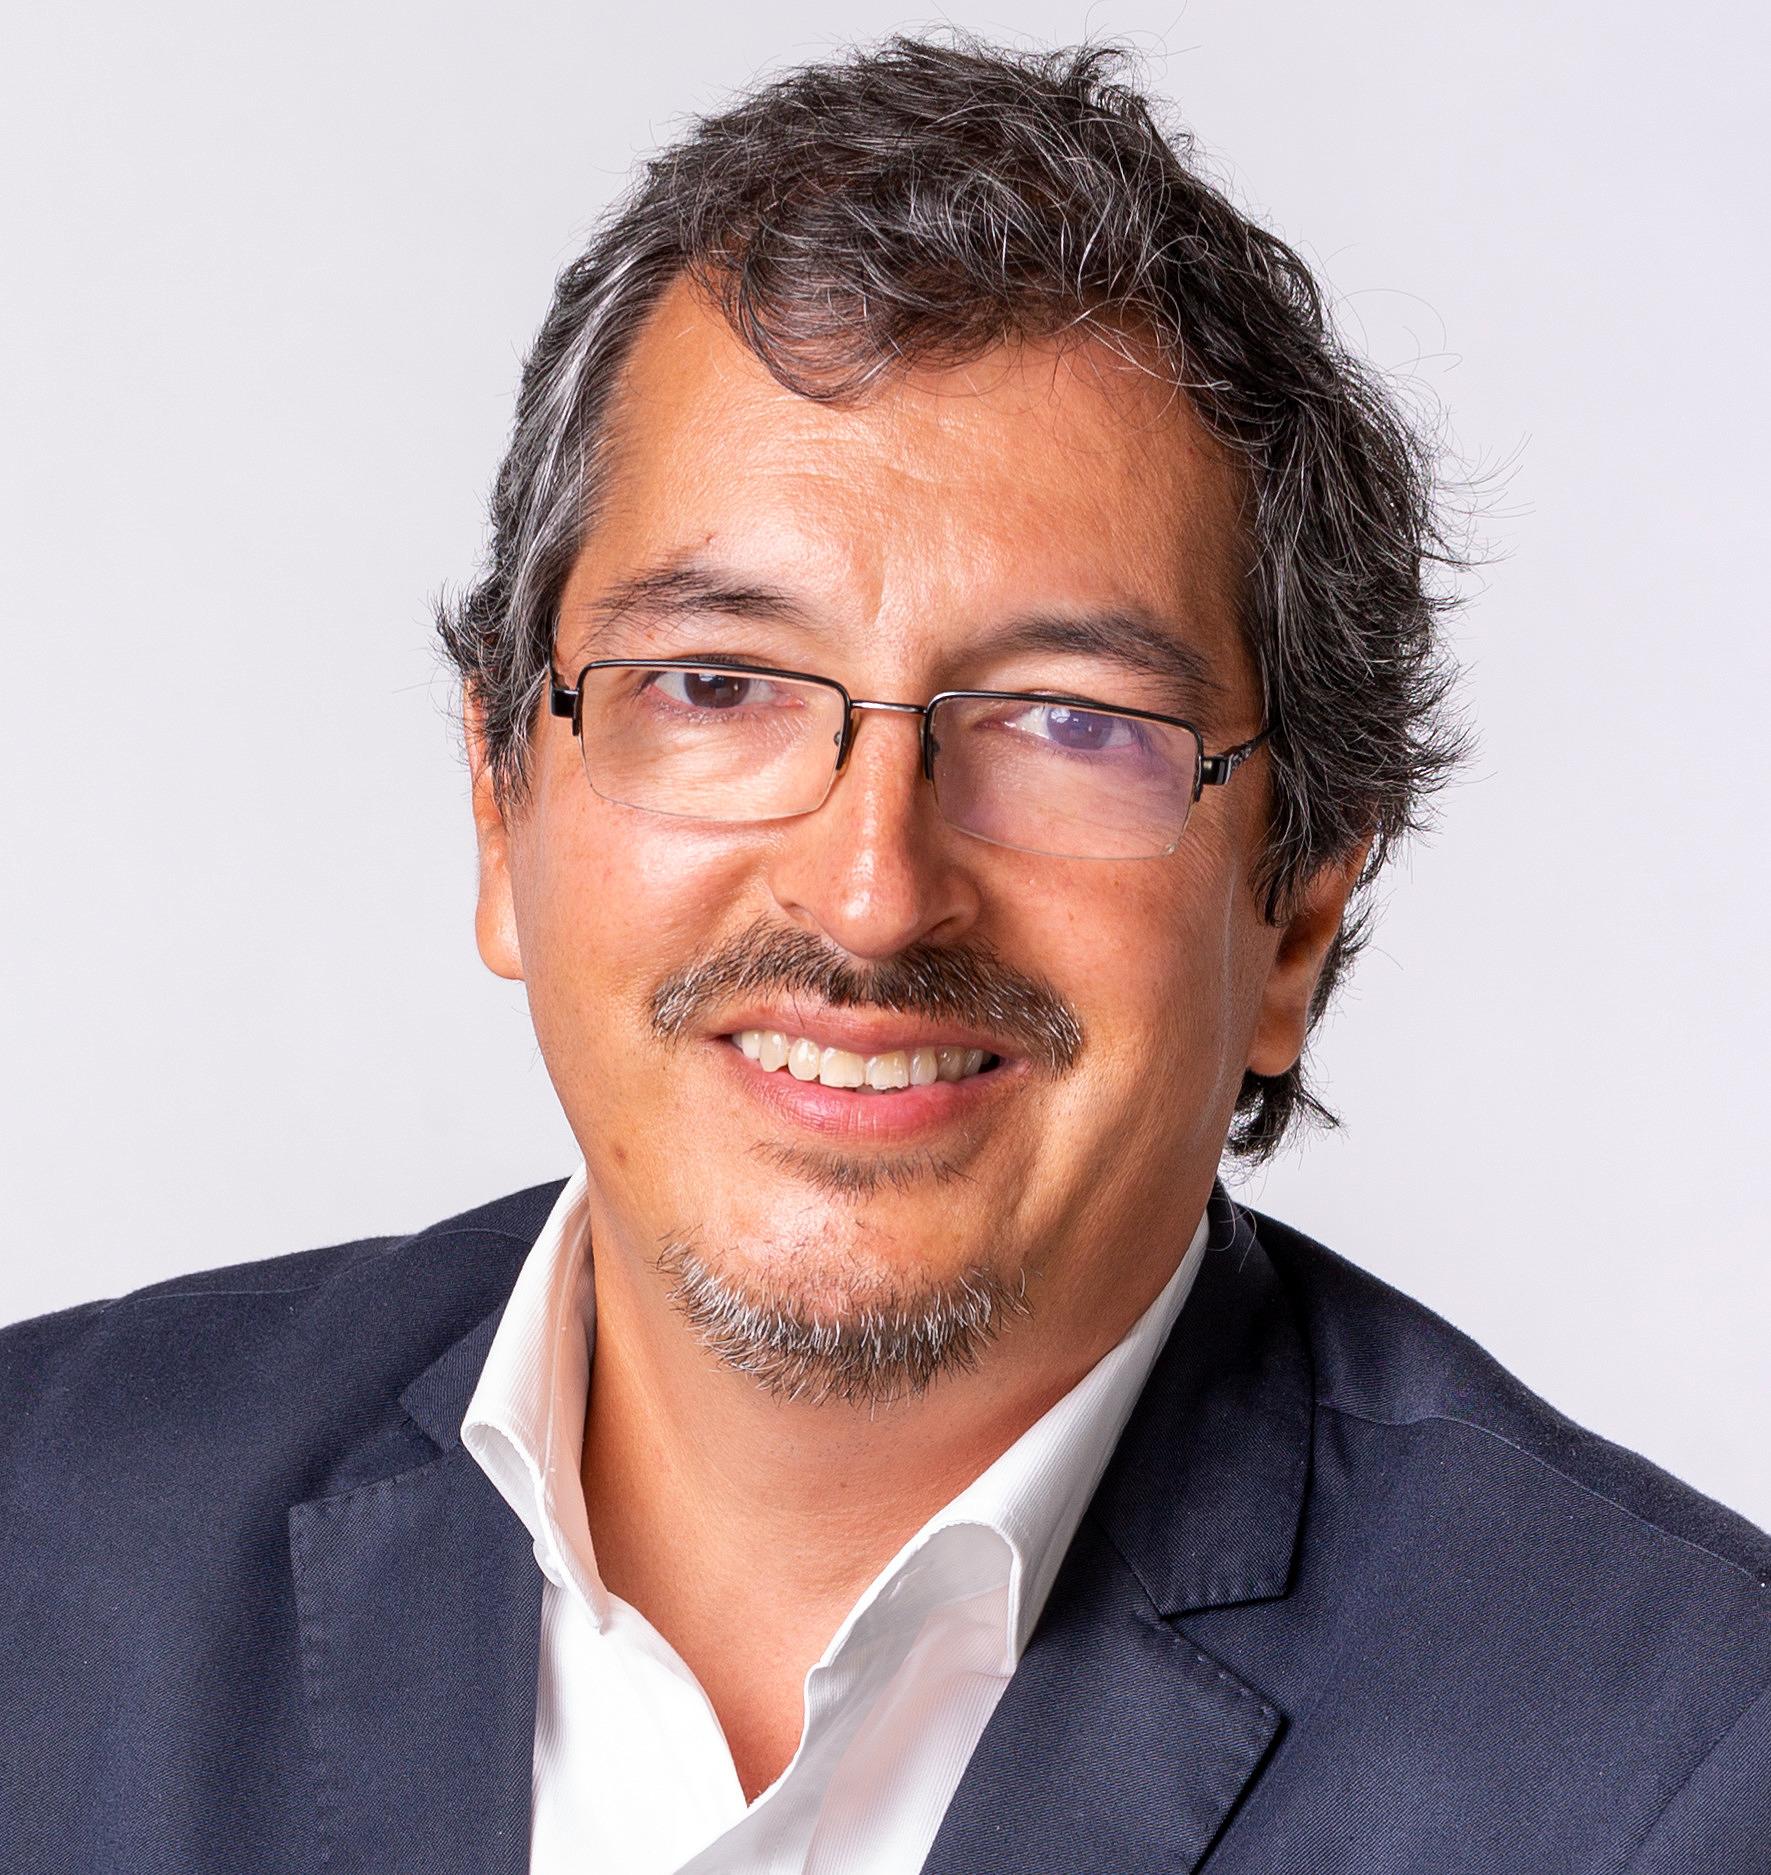 Juan José Tirado